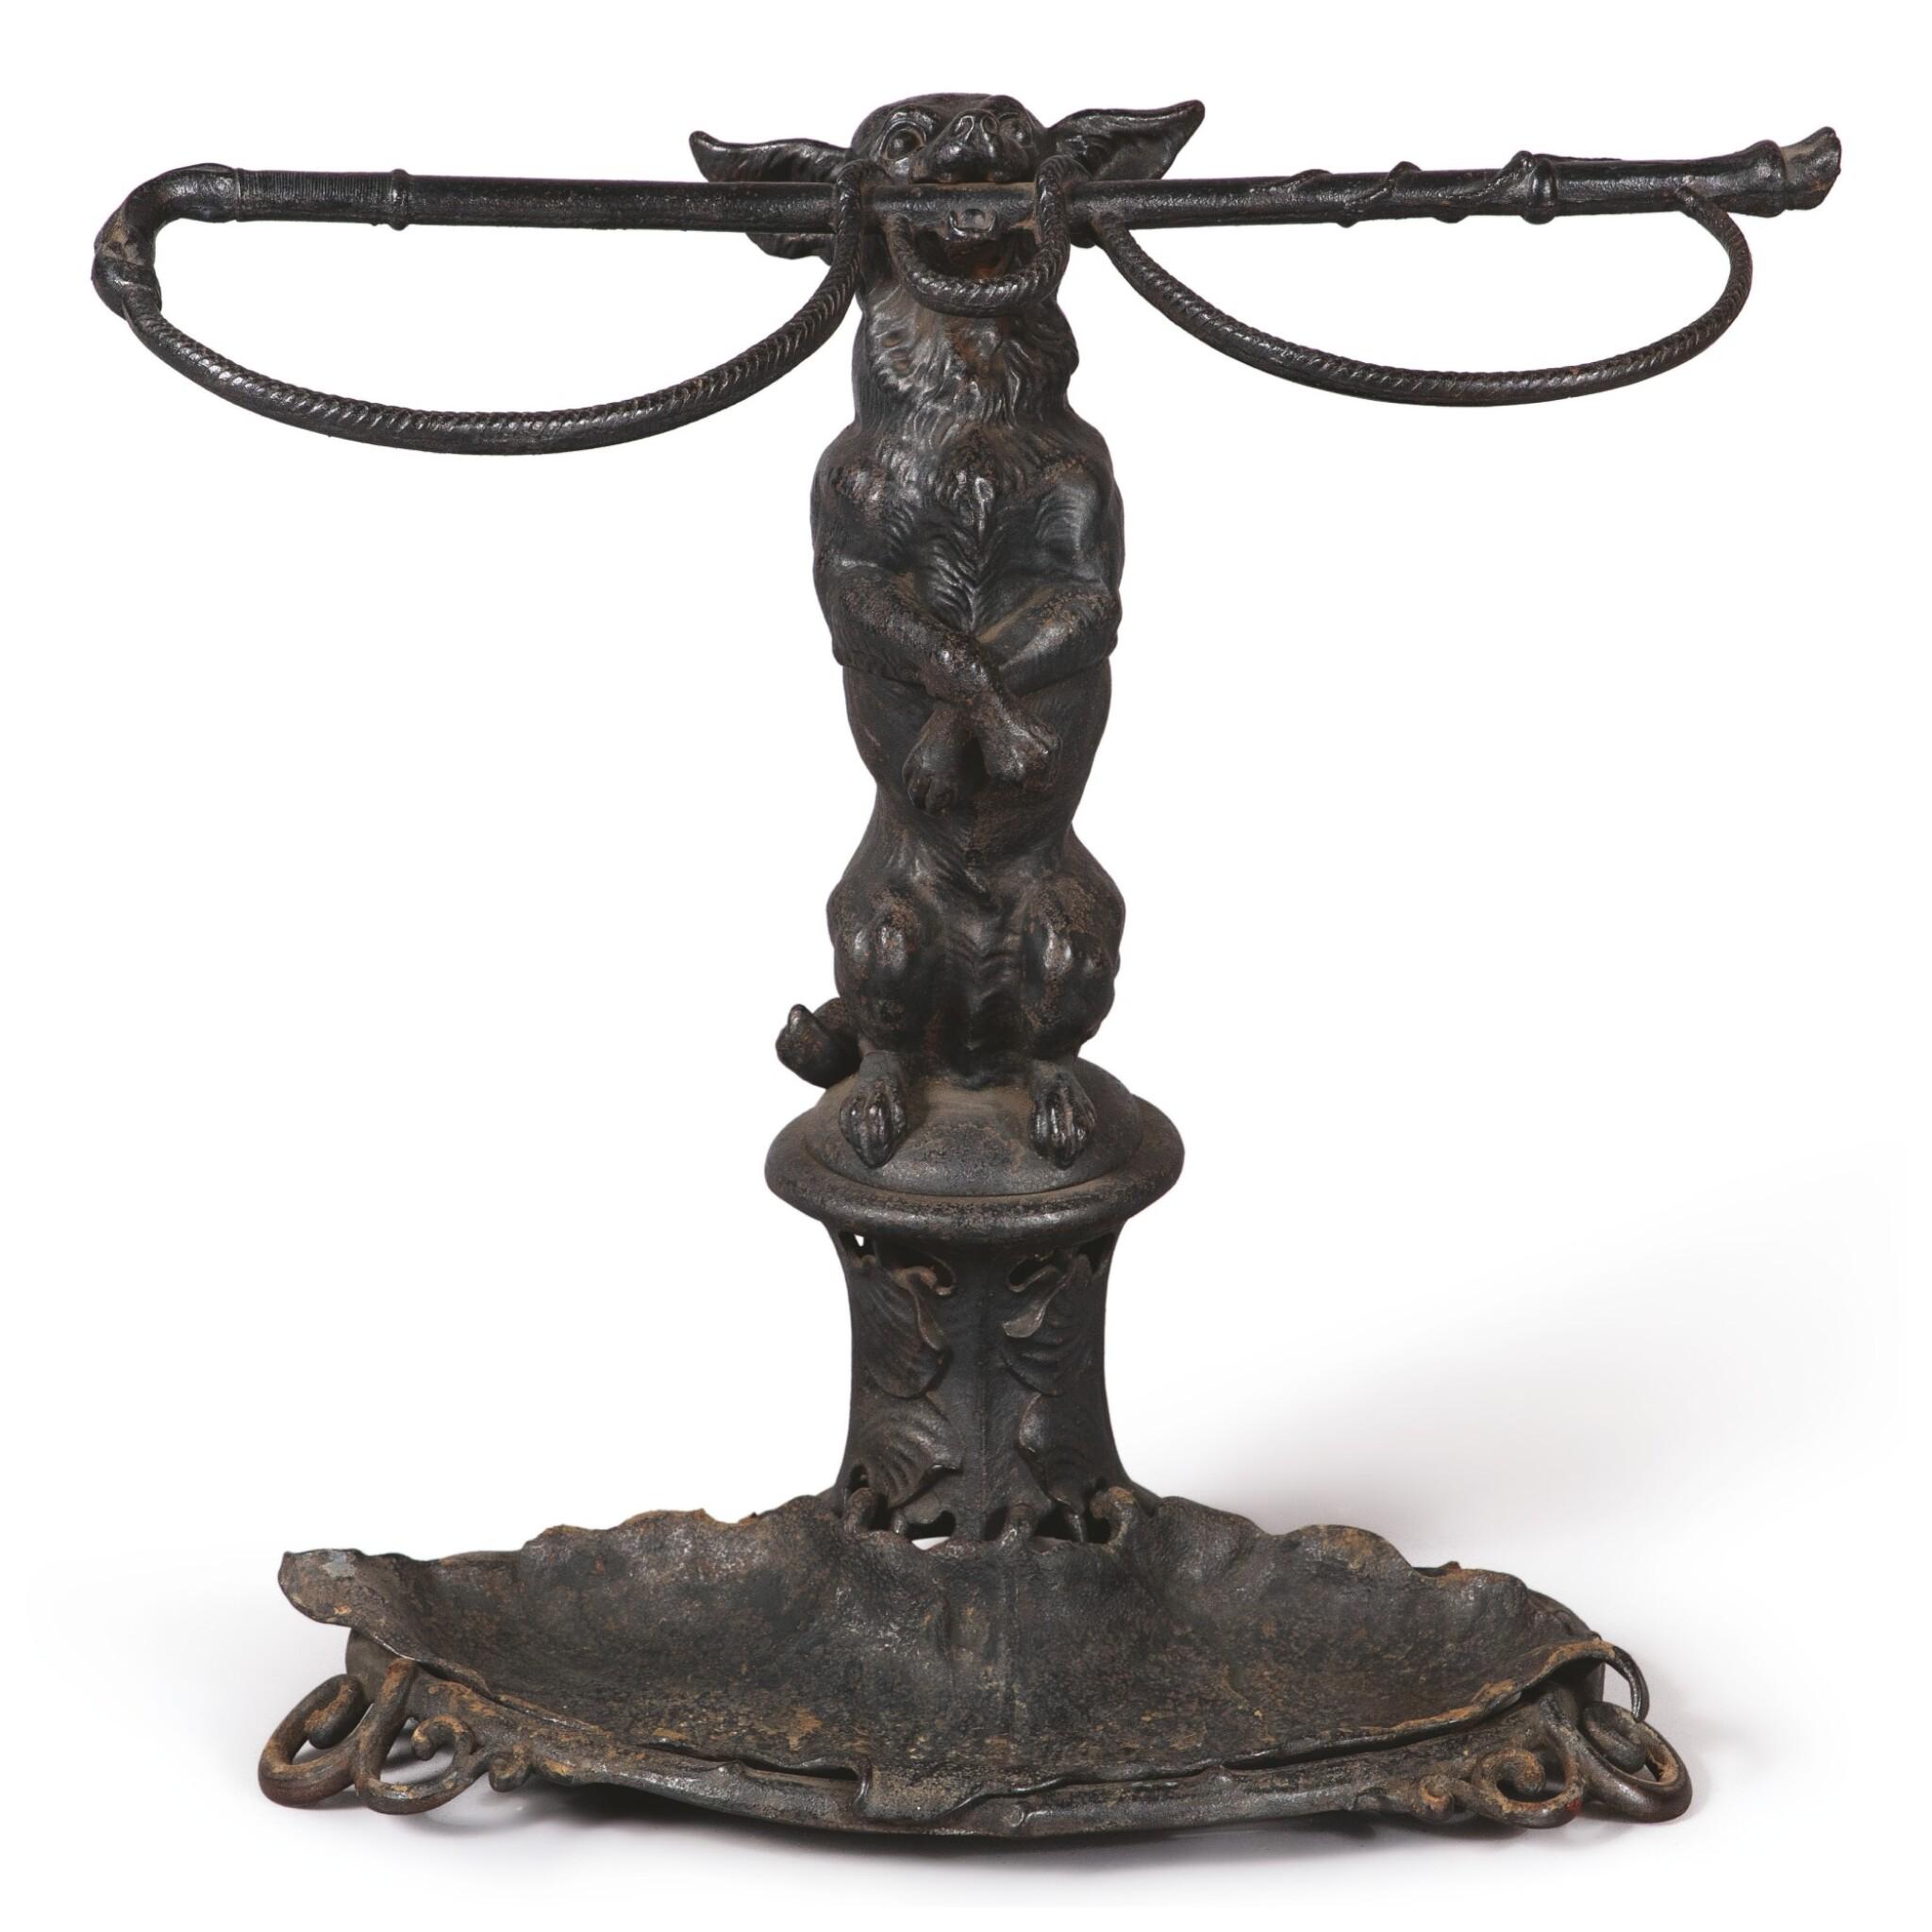 A CAST IRON COALBROOKDALE STICK OR UMBRELLA STAND, LATE 19TH CENTURY